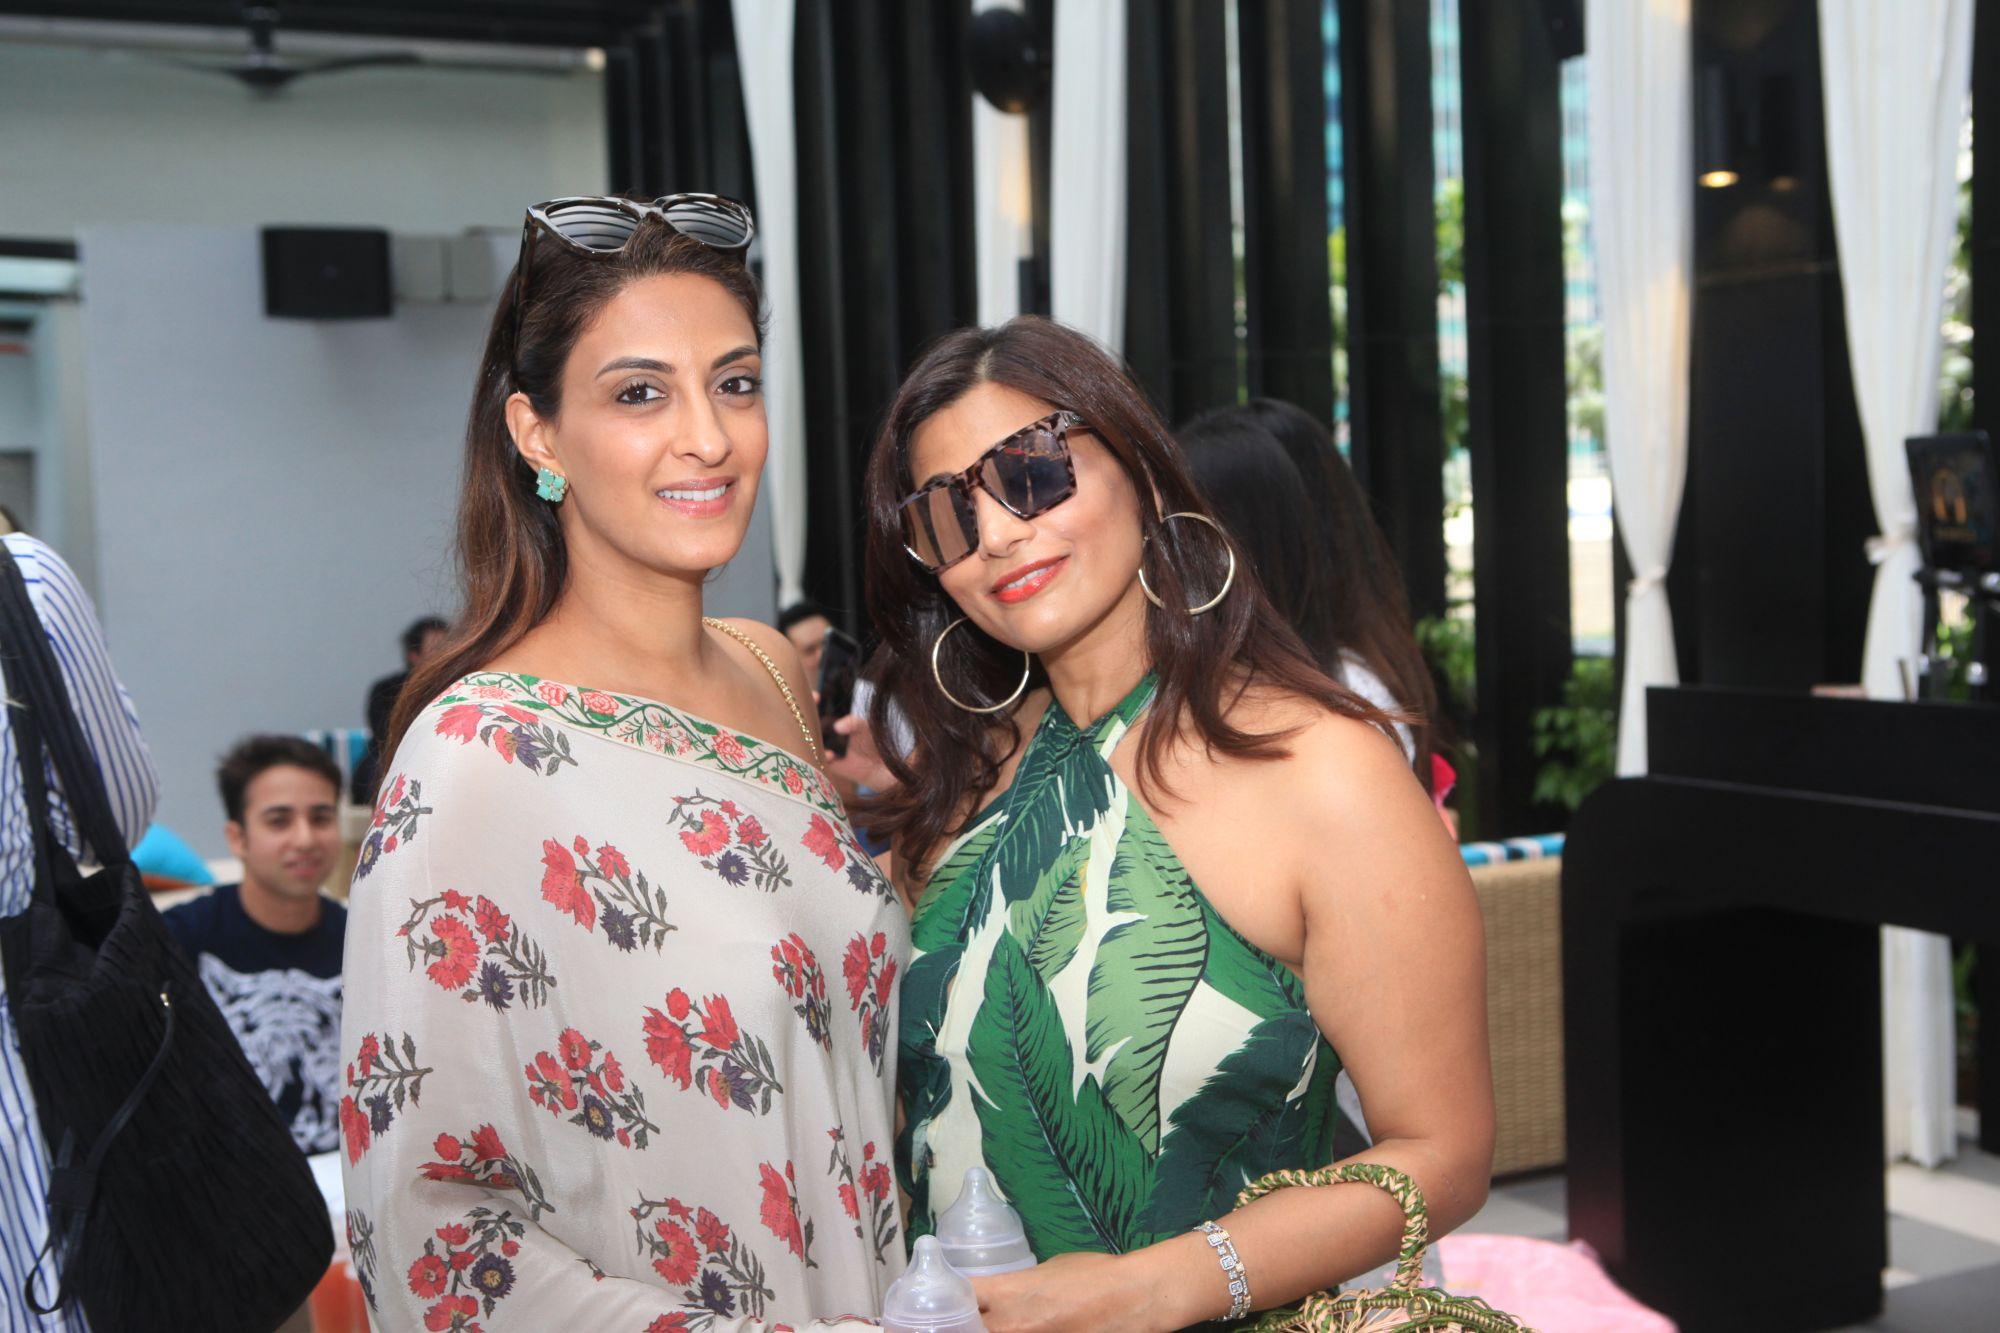 Shireena Shroff Manchharam, Seema Bhojwani